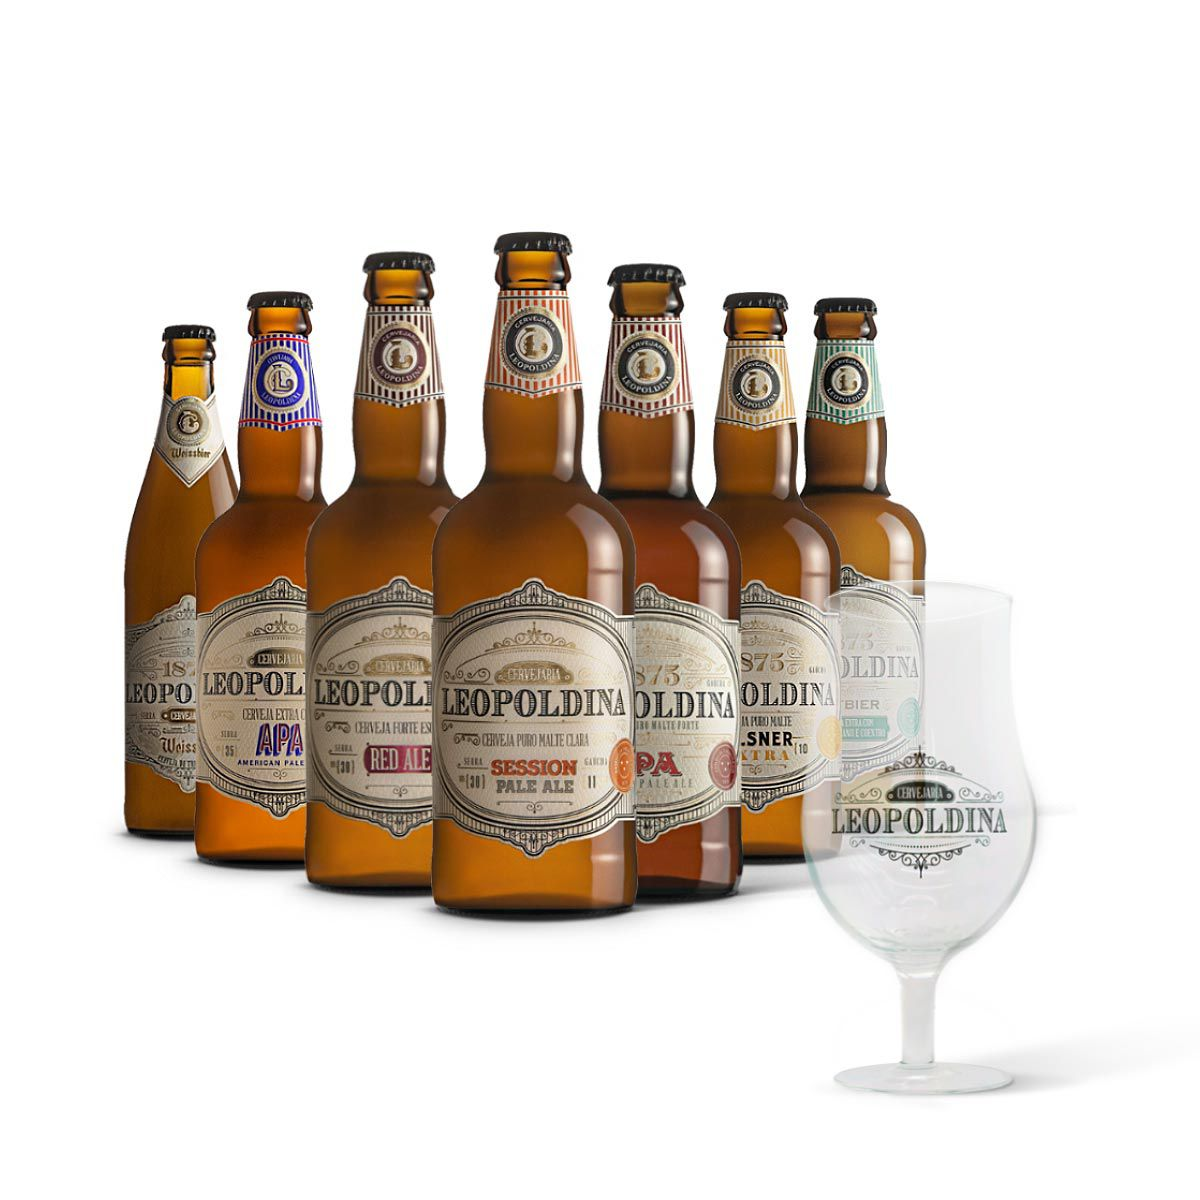 Kit degustação Leopoldina 7 cervejas + Brinde Taça Tulipa Leopoldina